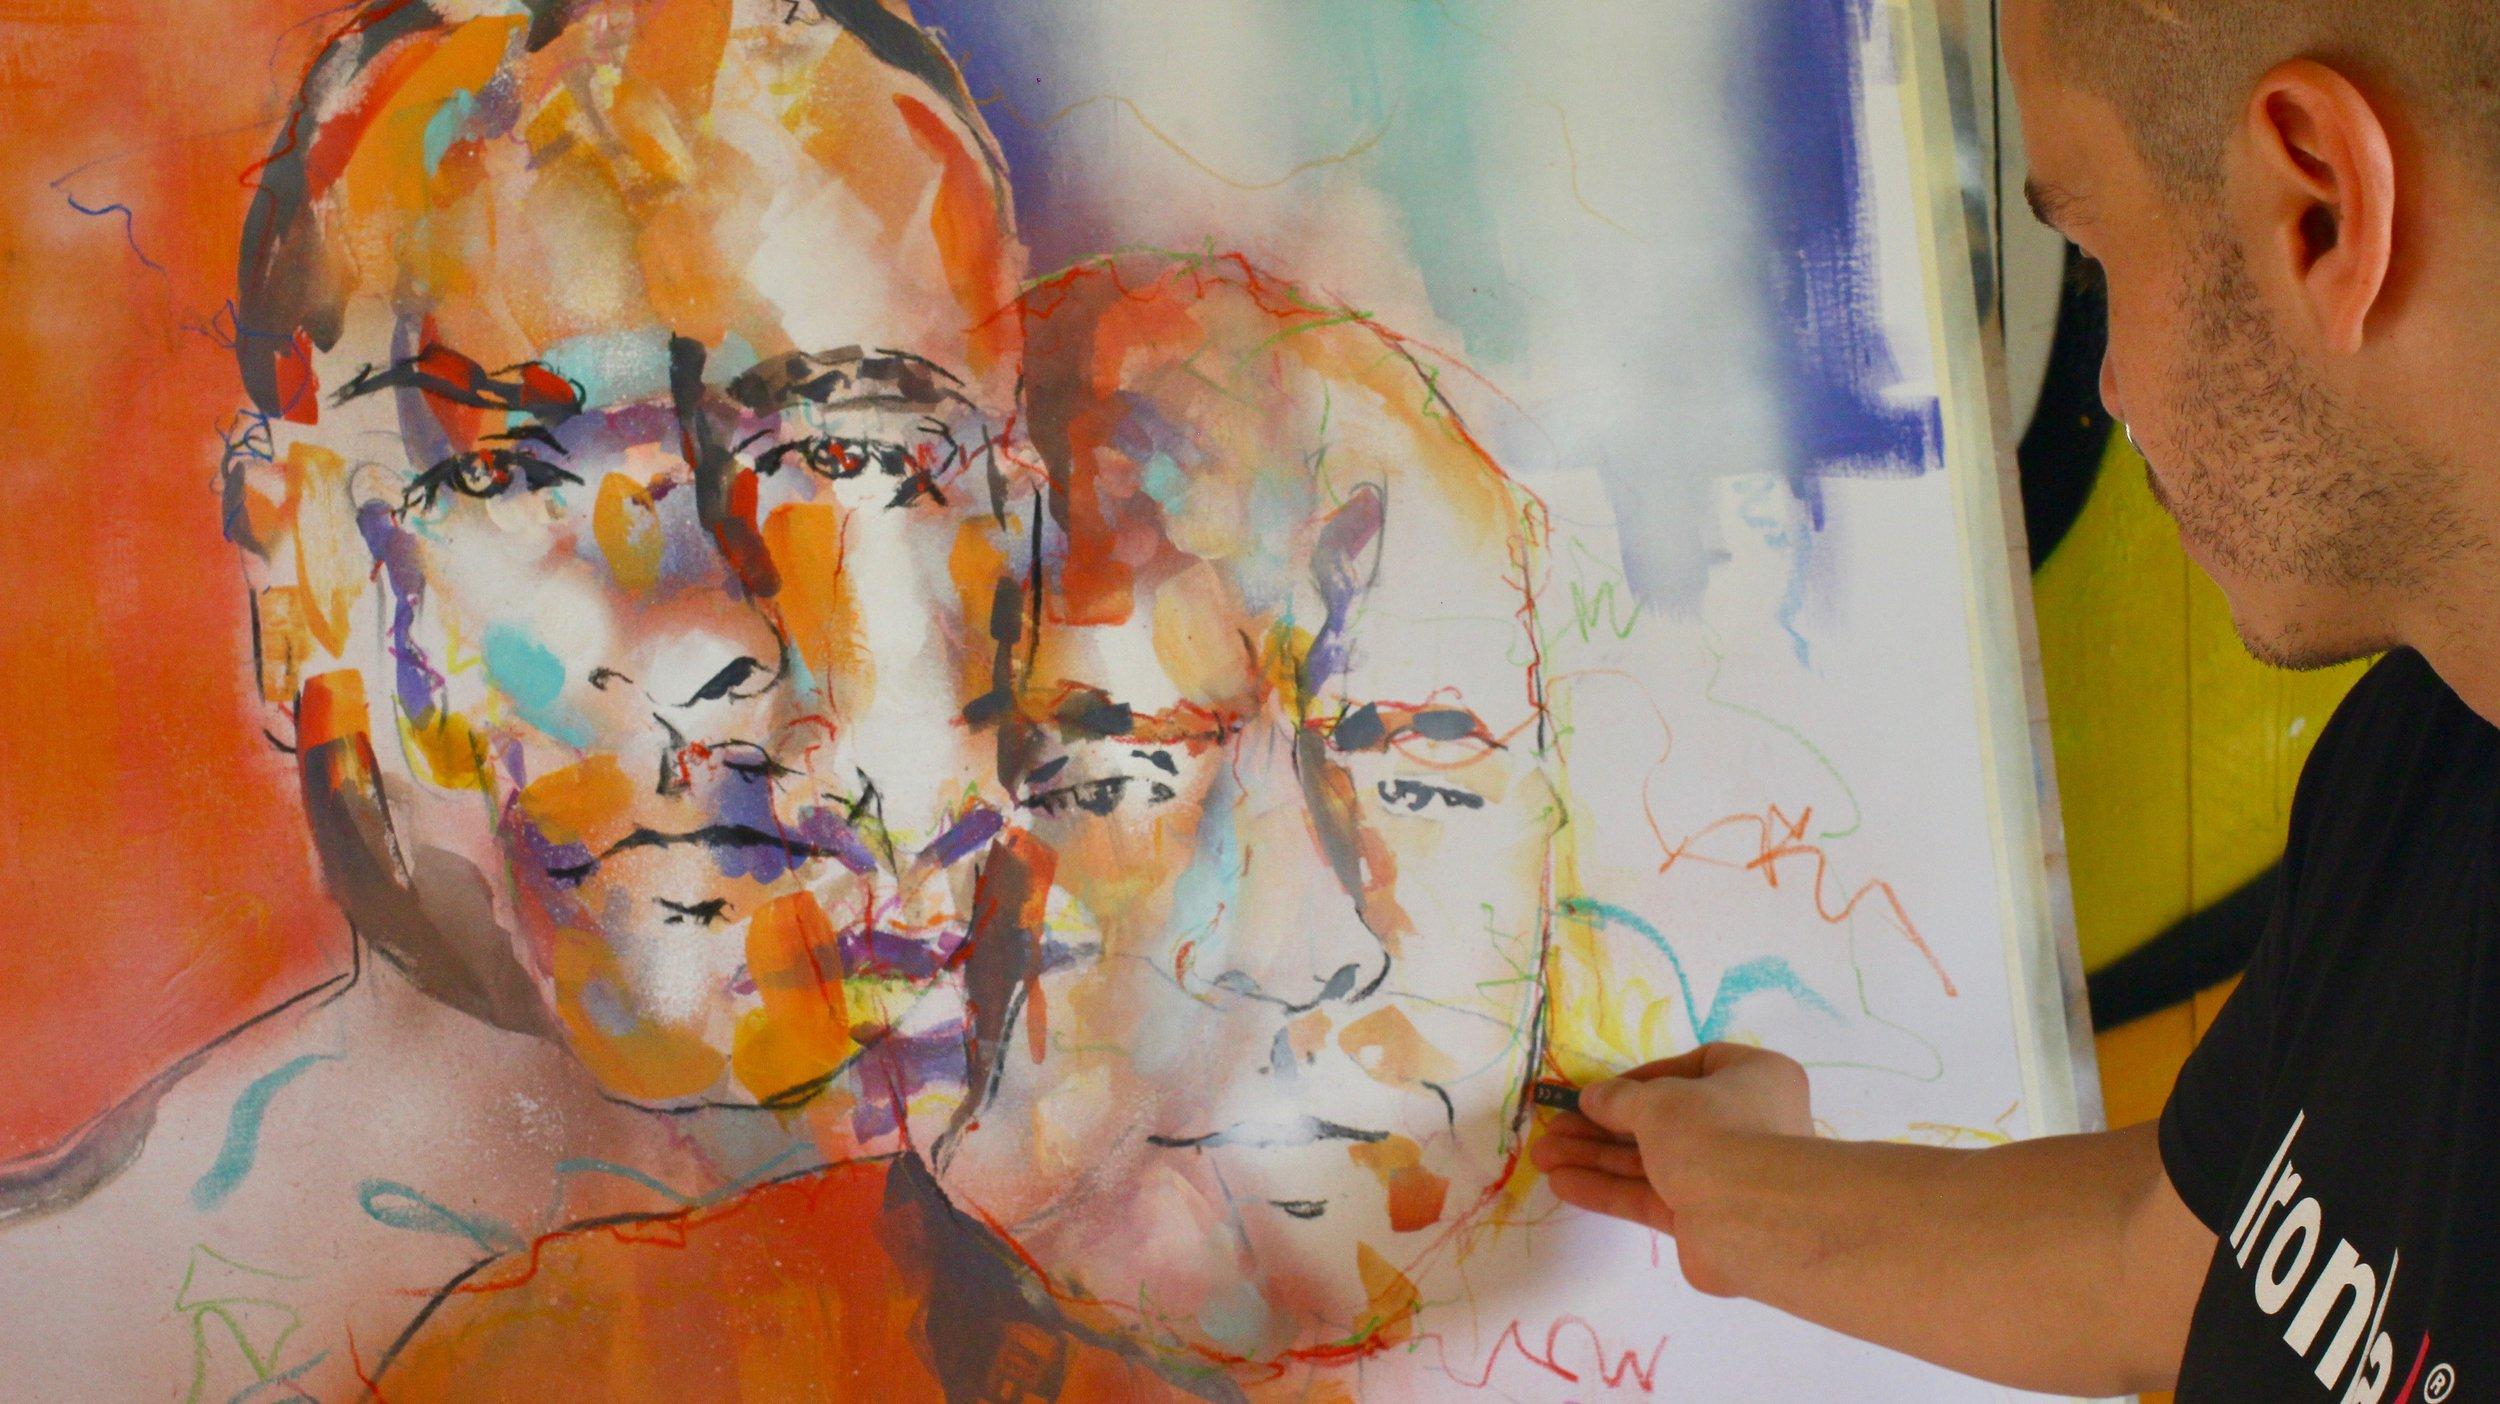 DEAN NENADICH ironlak the culprit club graffiti art brisbane gold coast